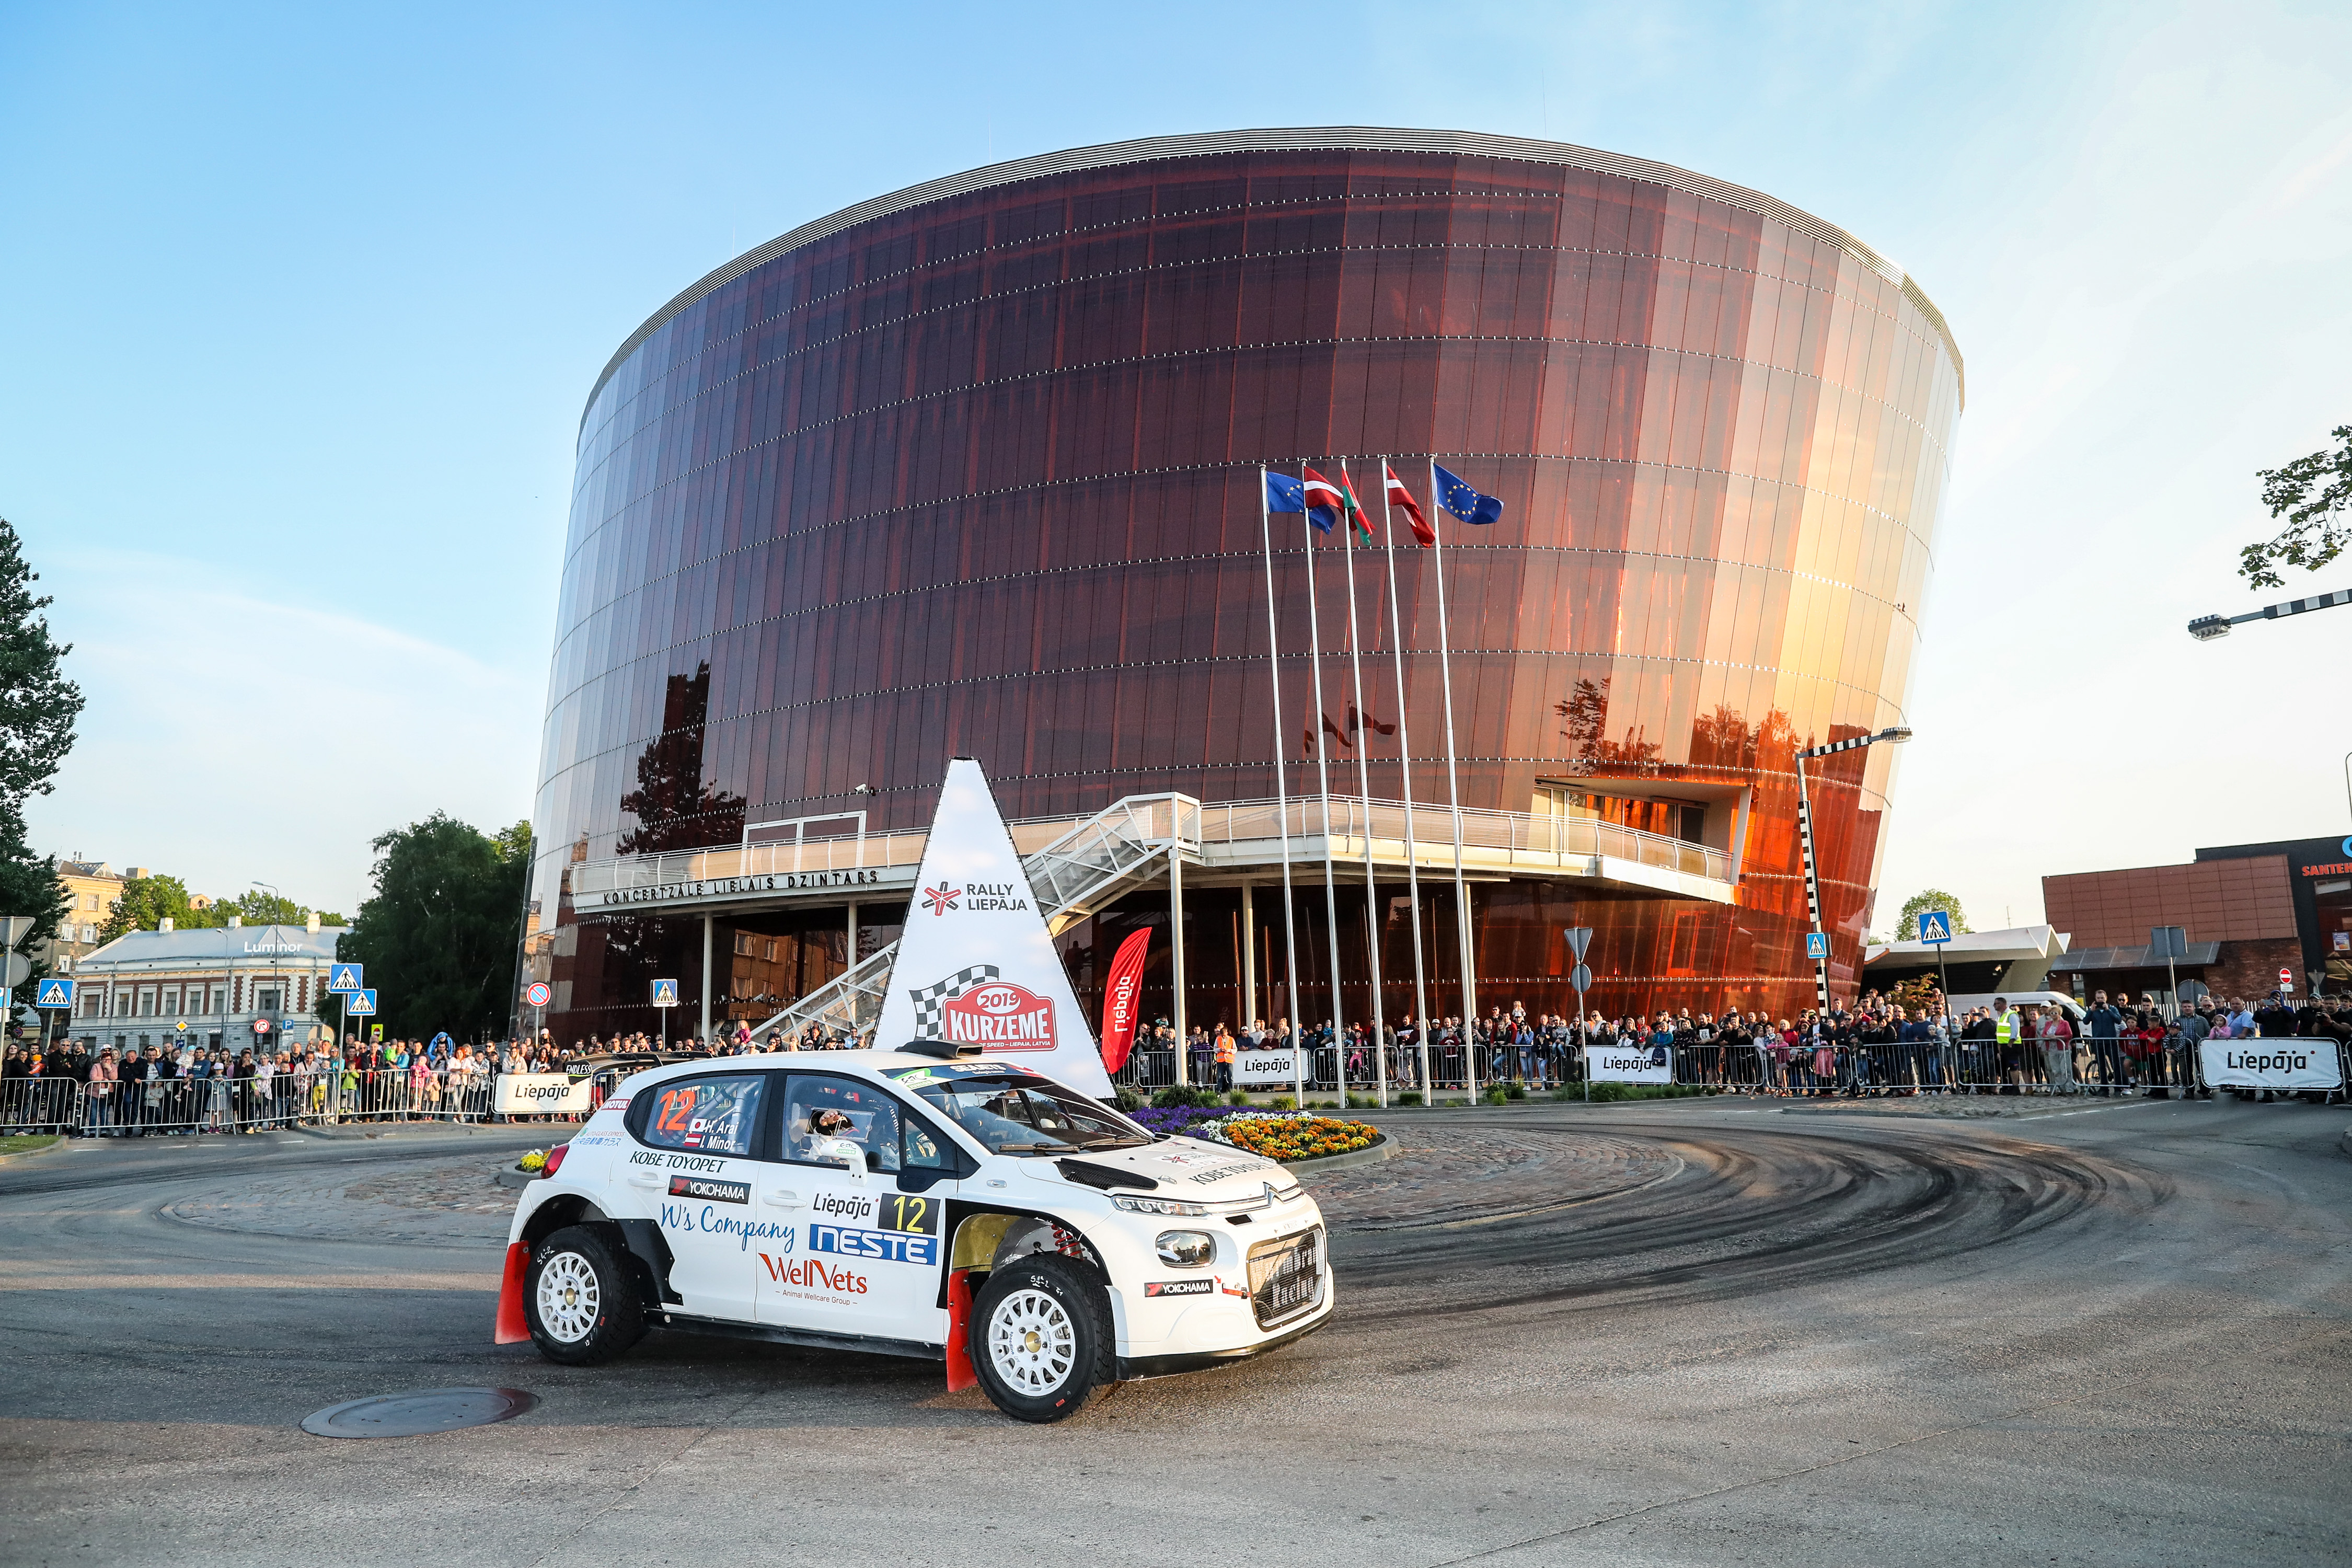 12 Hiroki ARAI, (JPN), Ilka MINOR, (AUT), Citroën C3 R5, STARD, action during the 2019 European Rally Championship ERC Liepaja rally,  from may 24 to 26, at Liepaja, Lettonie - Photo Alexandre Guillaumot / DPPI